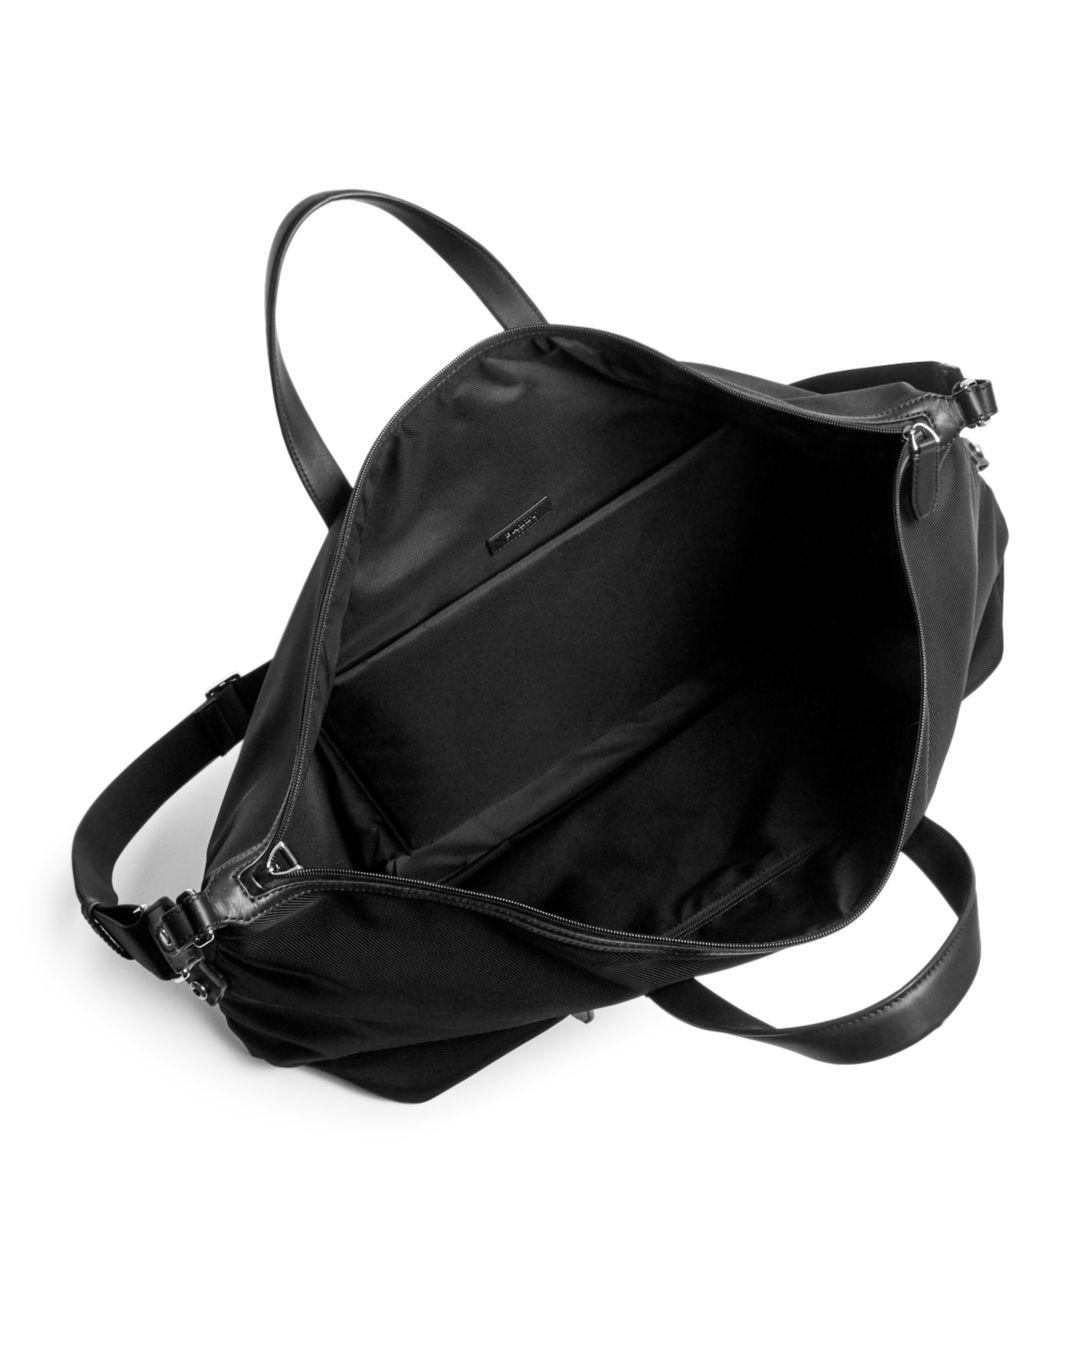 16f30c38eb9 Bally Camer Weekender in Black for Men - Lyst